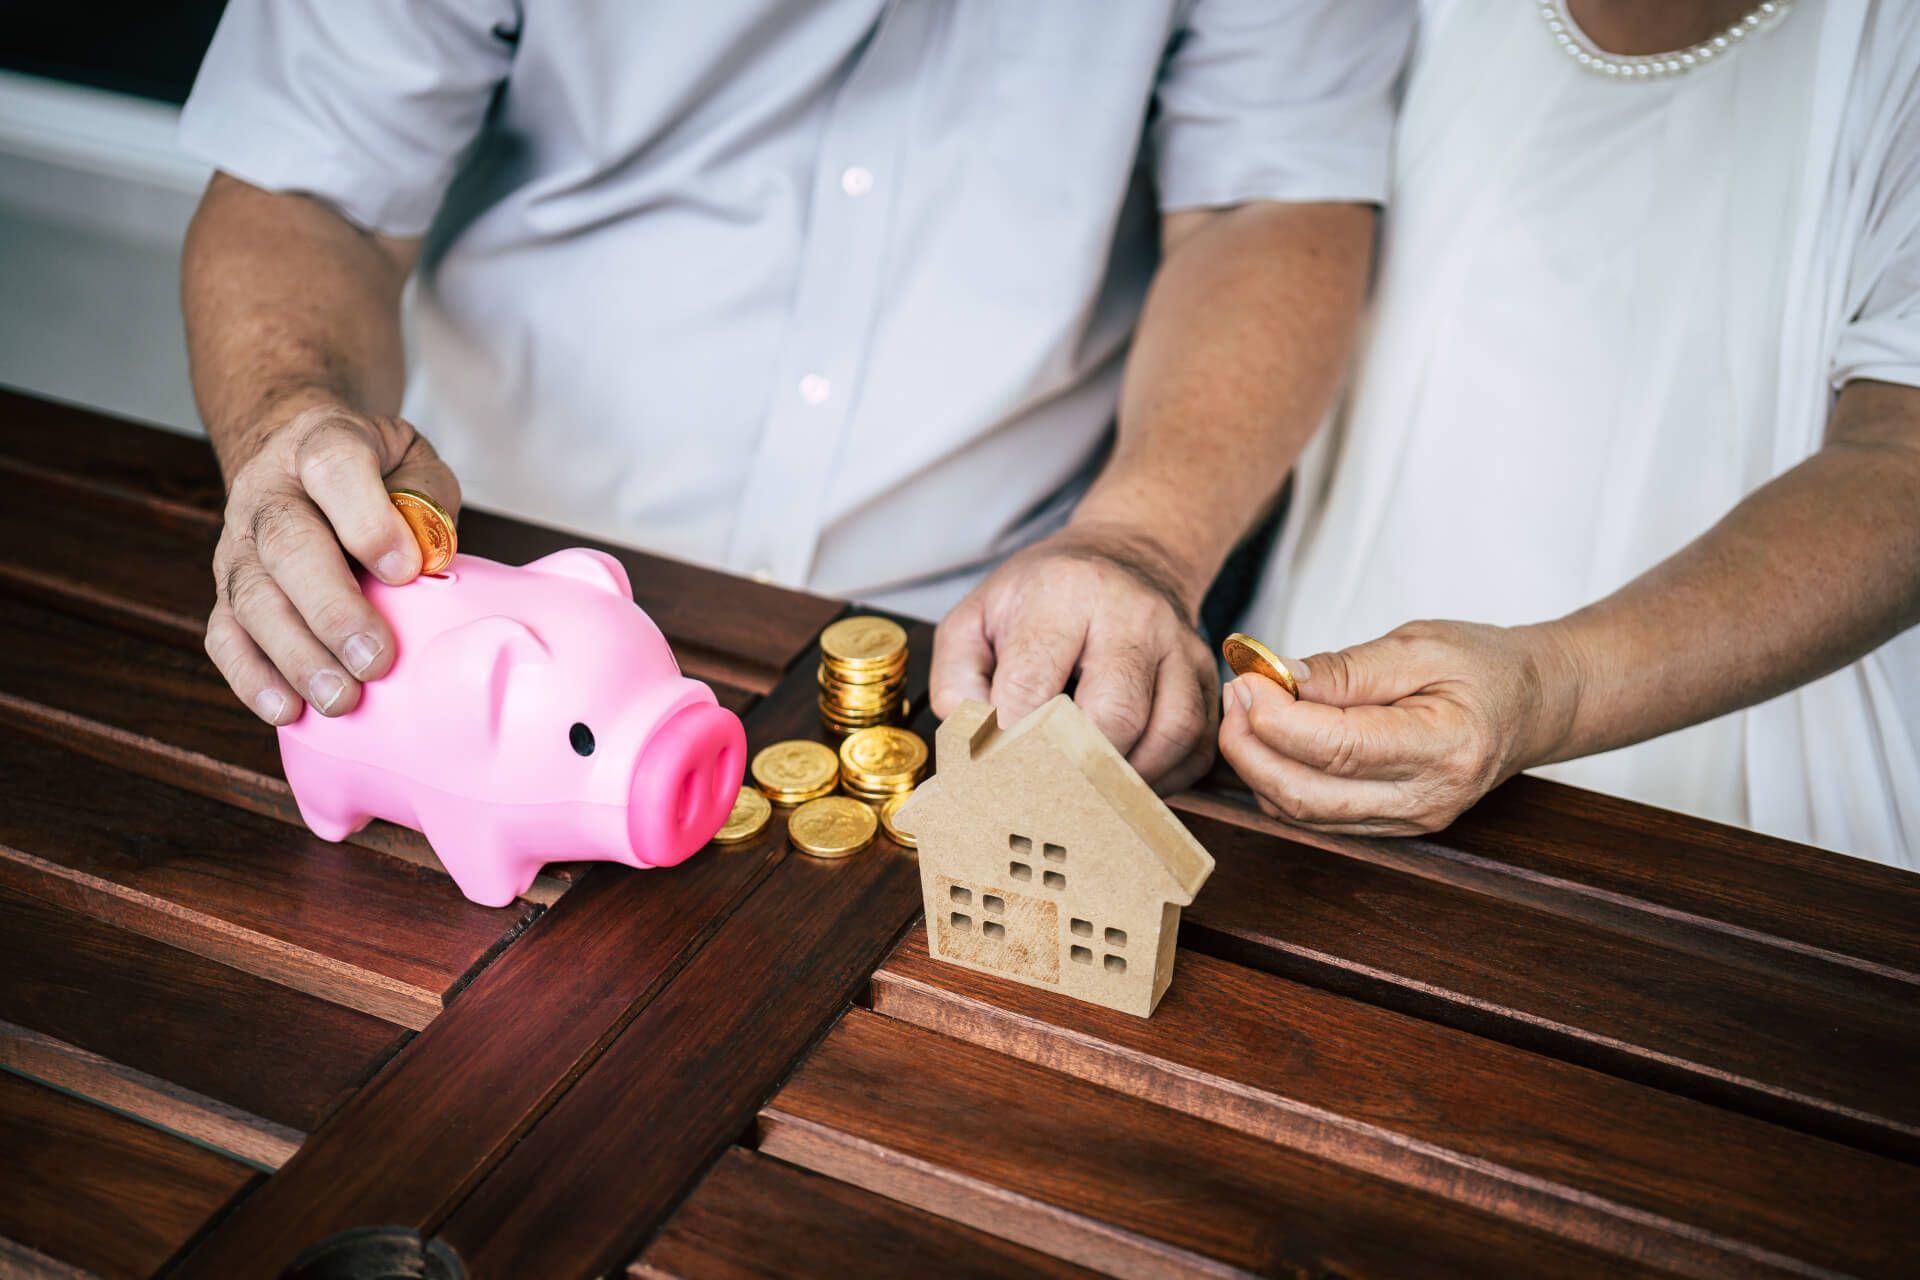 Tough times for Australia's landlords